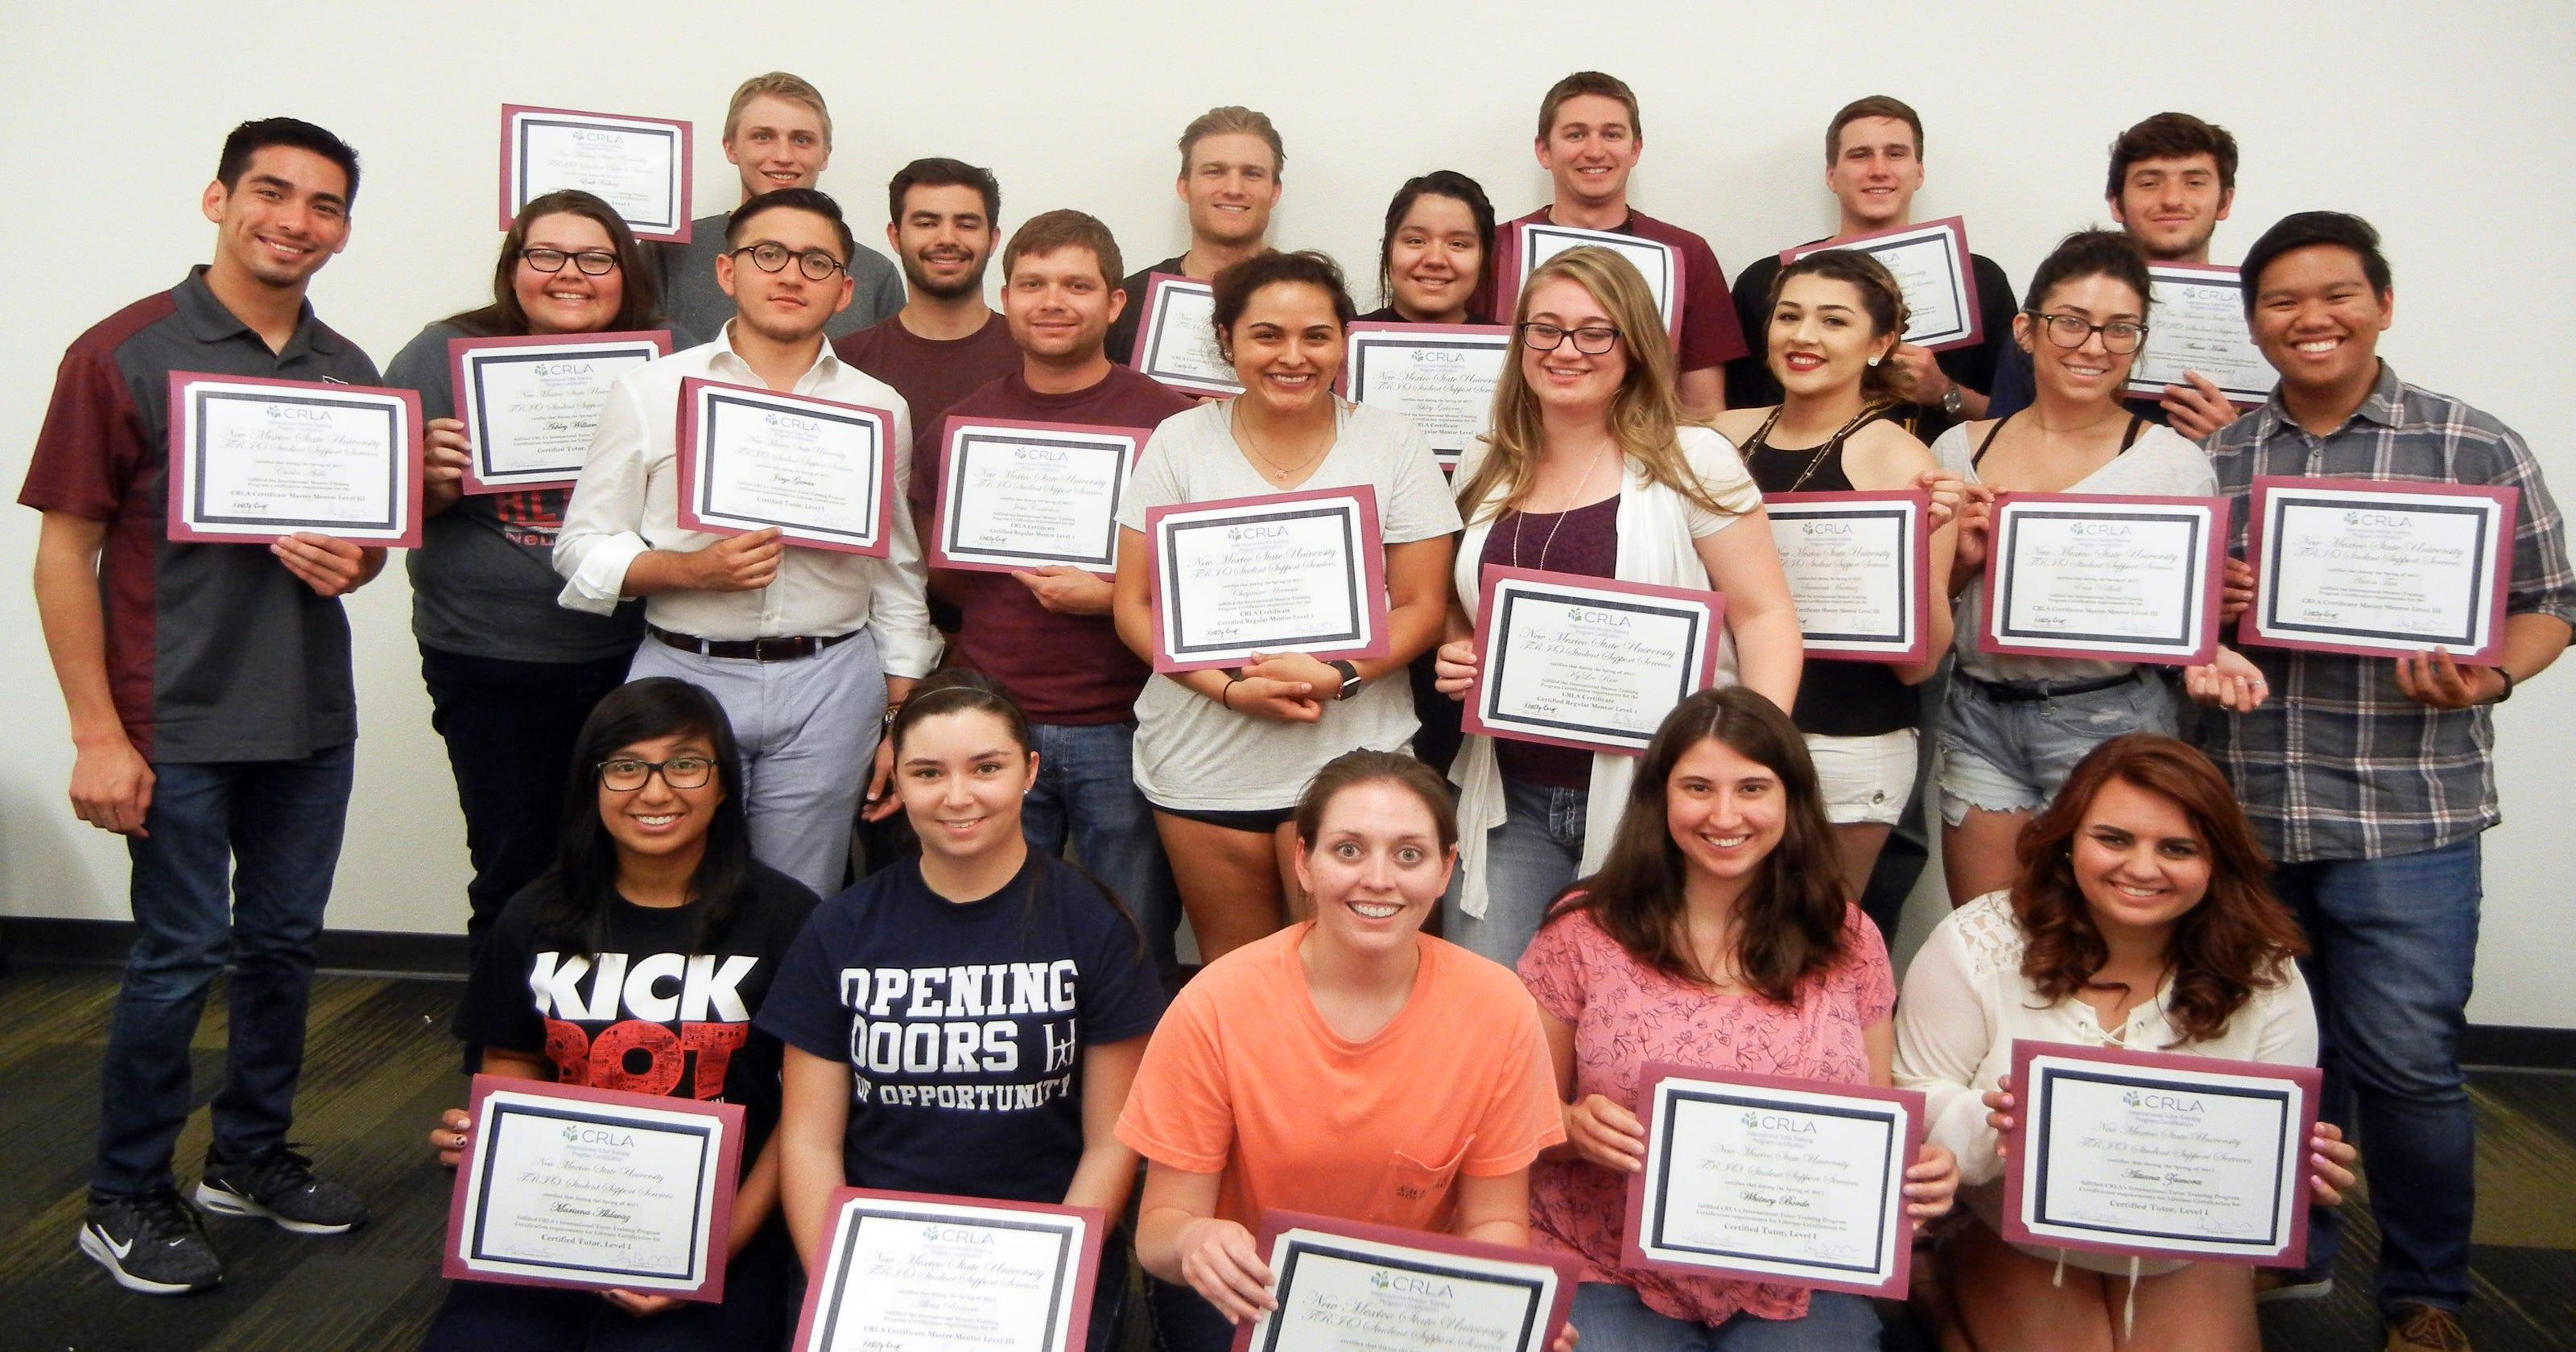 Nmsu Tutoring Mentoring Programs Receive National Certification